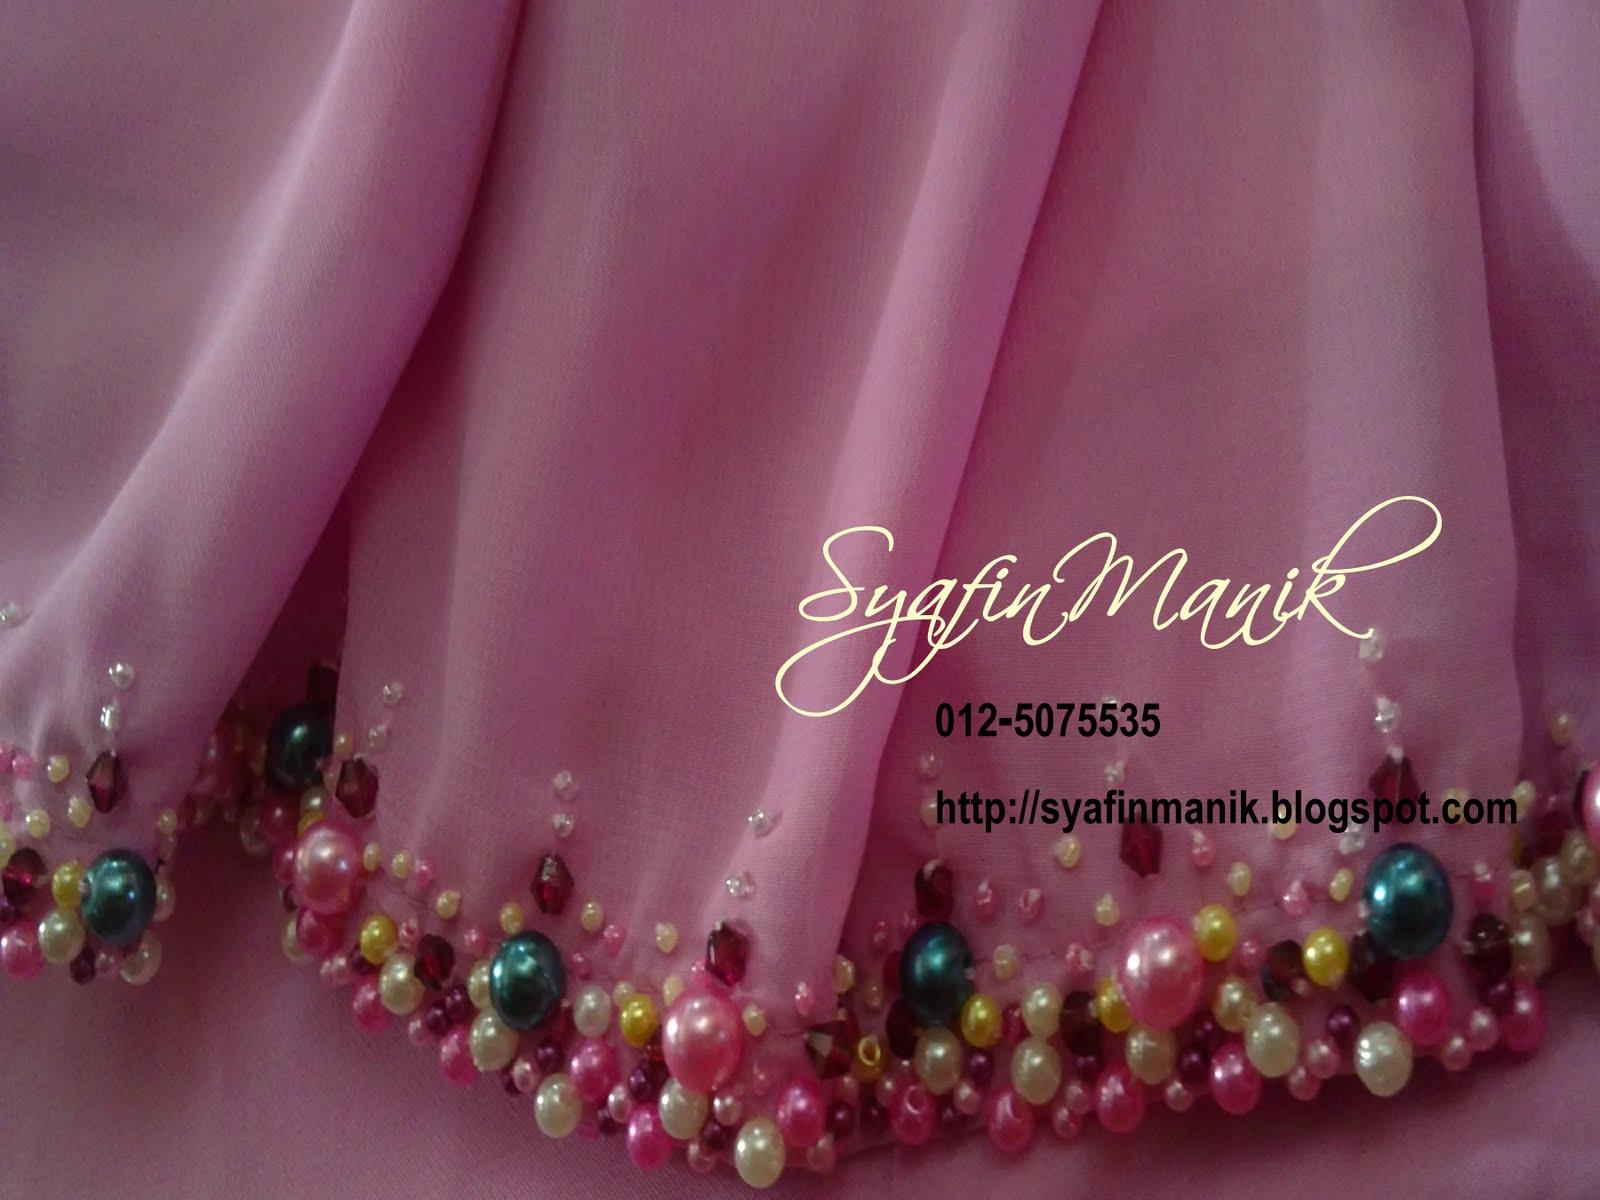 Design+Manik Jahit Manik @ Beading | Kelas jahitan manik | Jual Manik ...